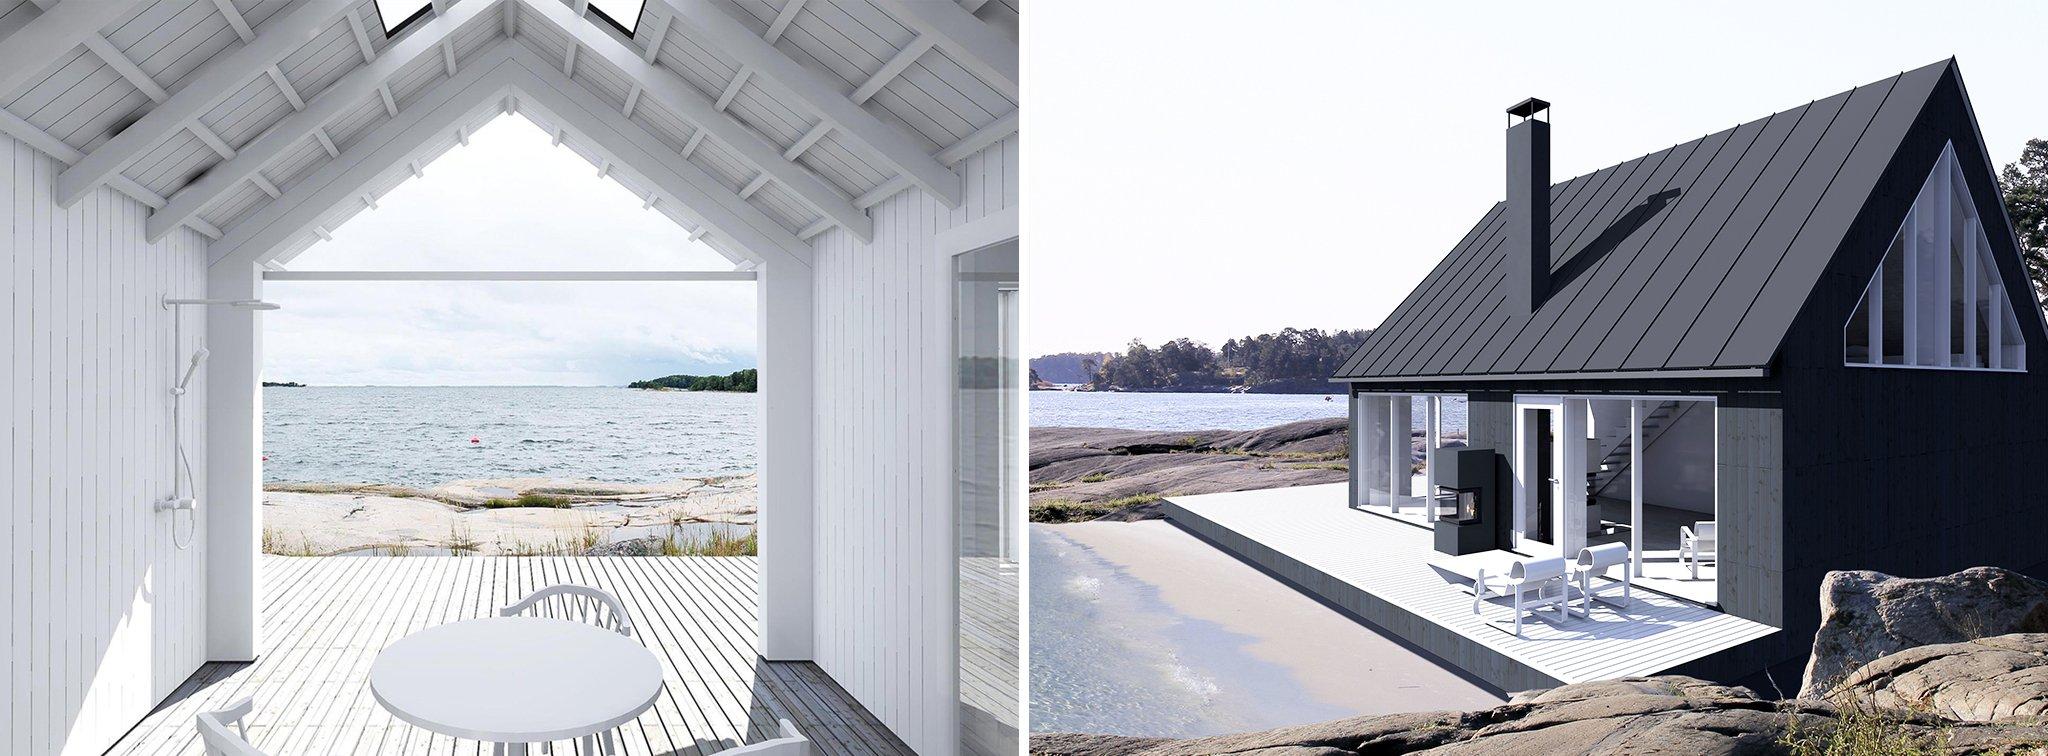 Sunhouse- Modernit puutalot